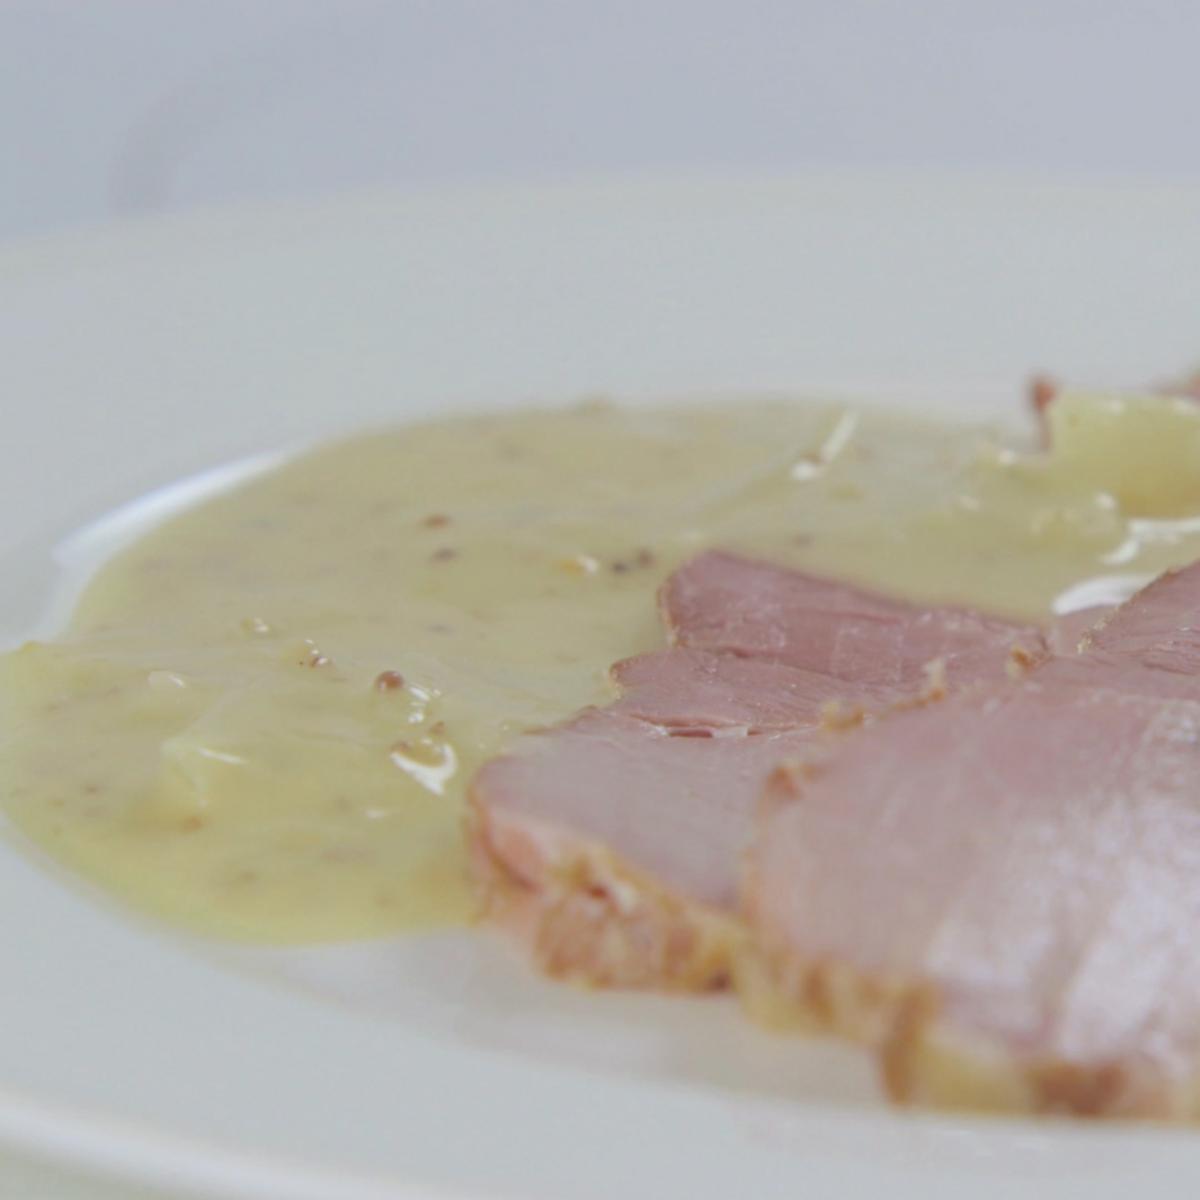 A picture of Delia's Onion and Mustard Sauce recipe